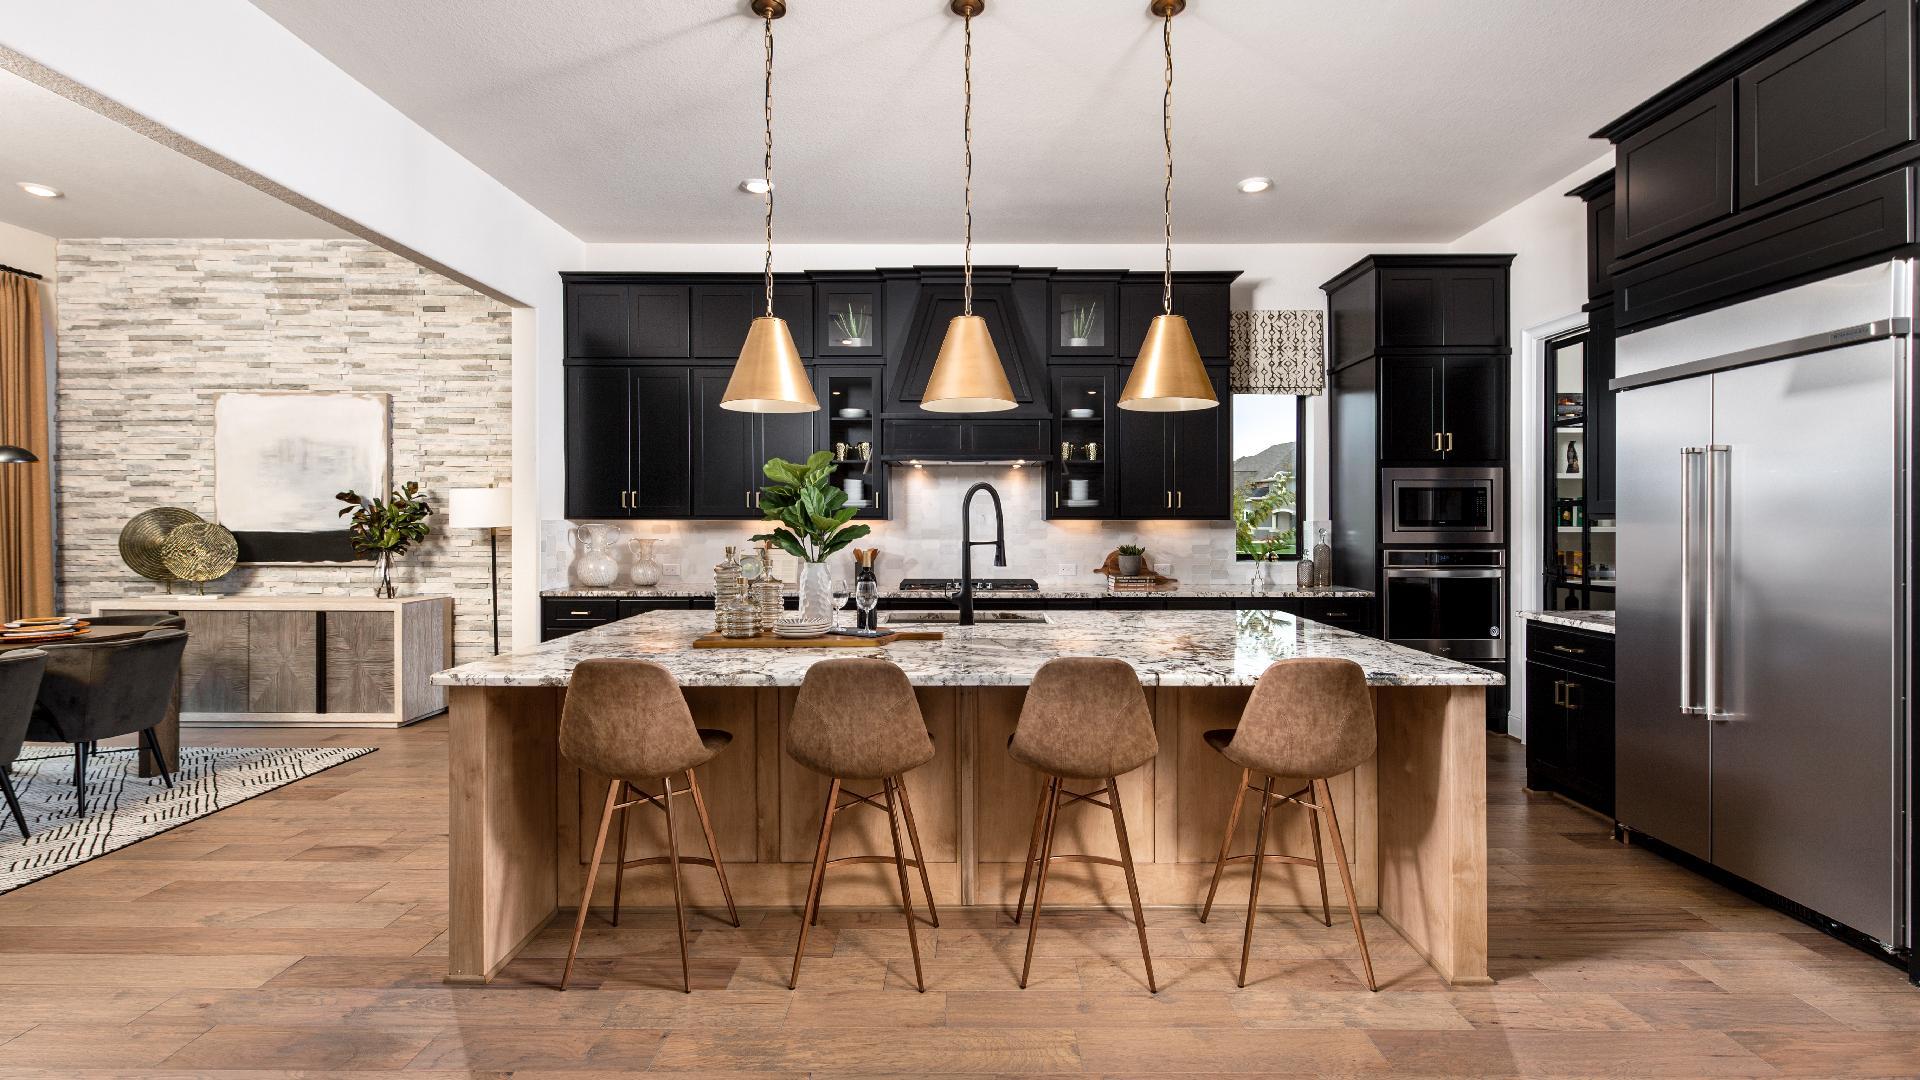 Stunning Valen kitchen layout makes for easy entertaining